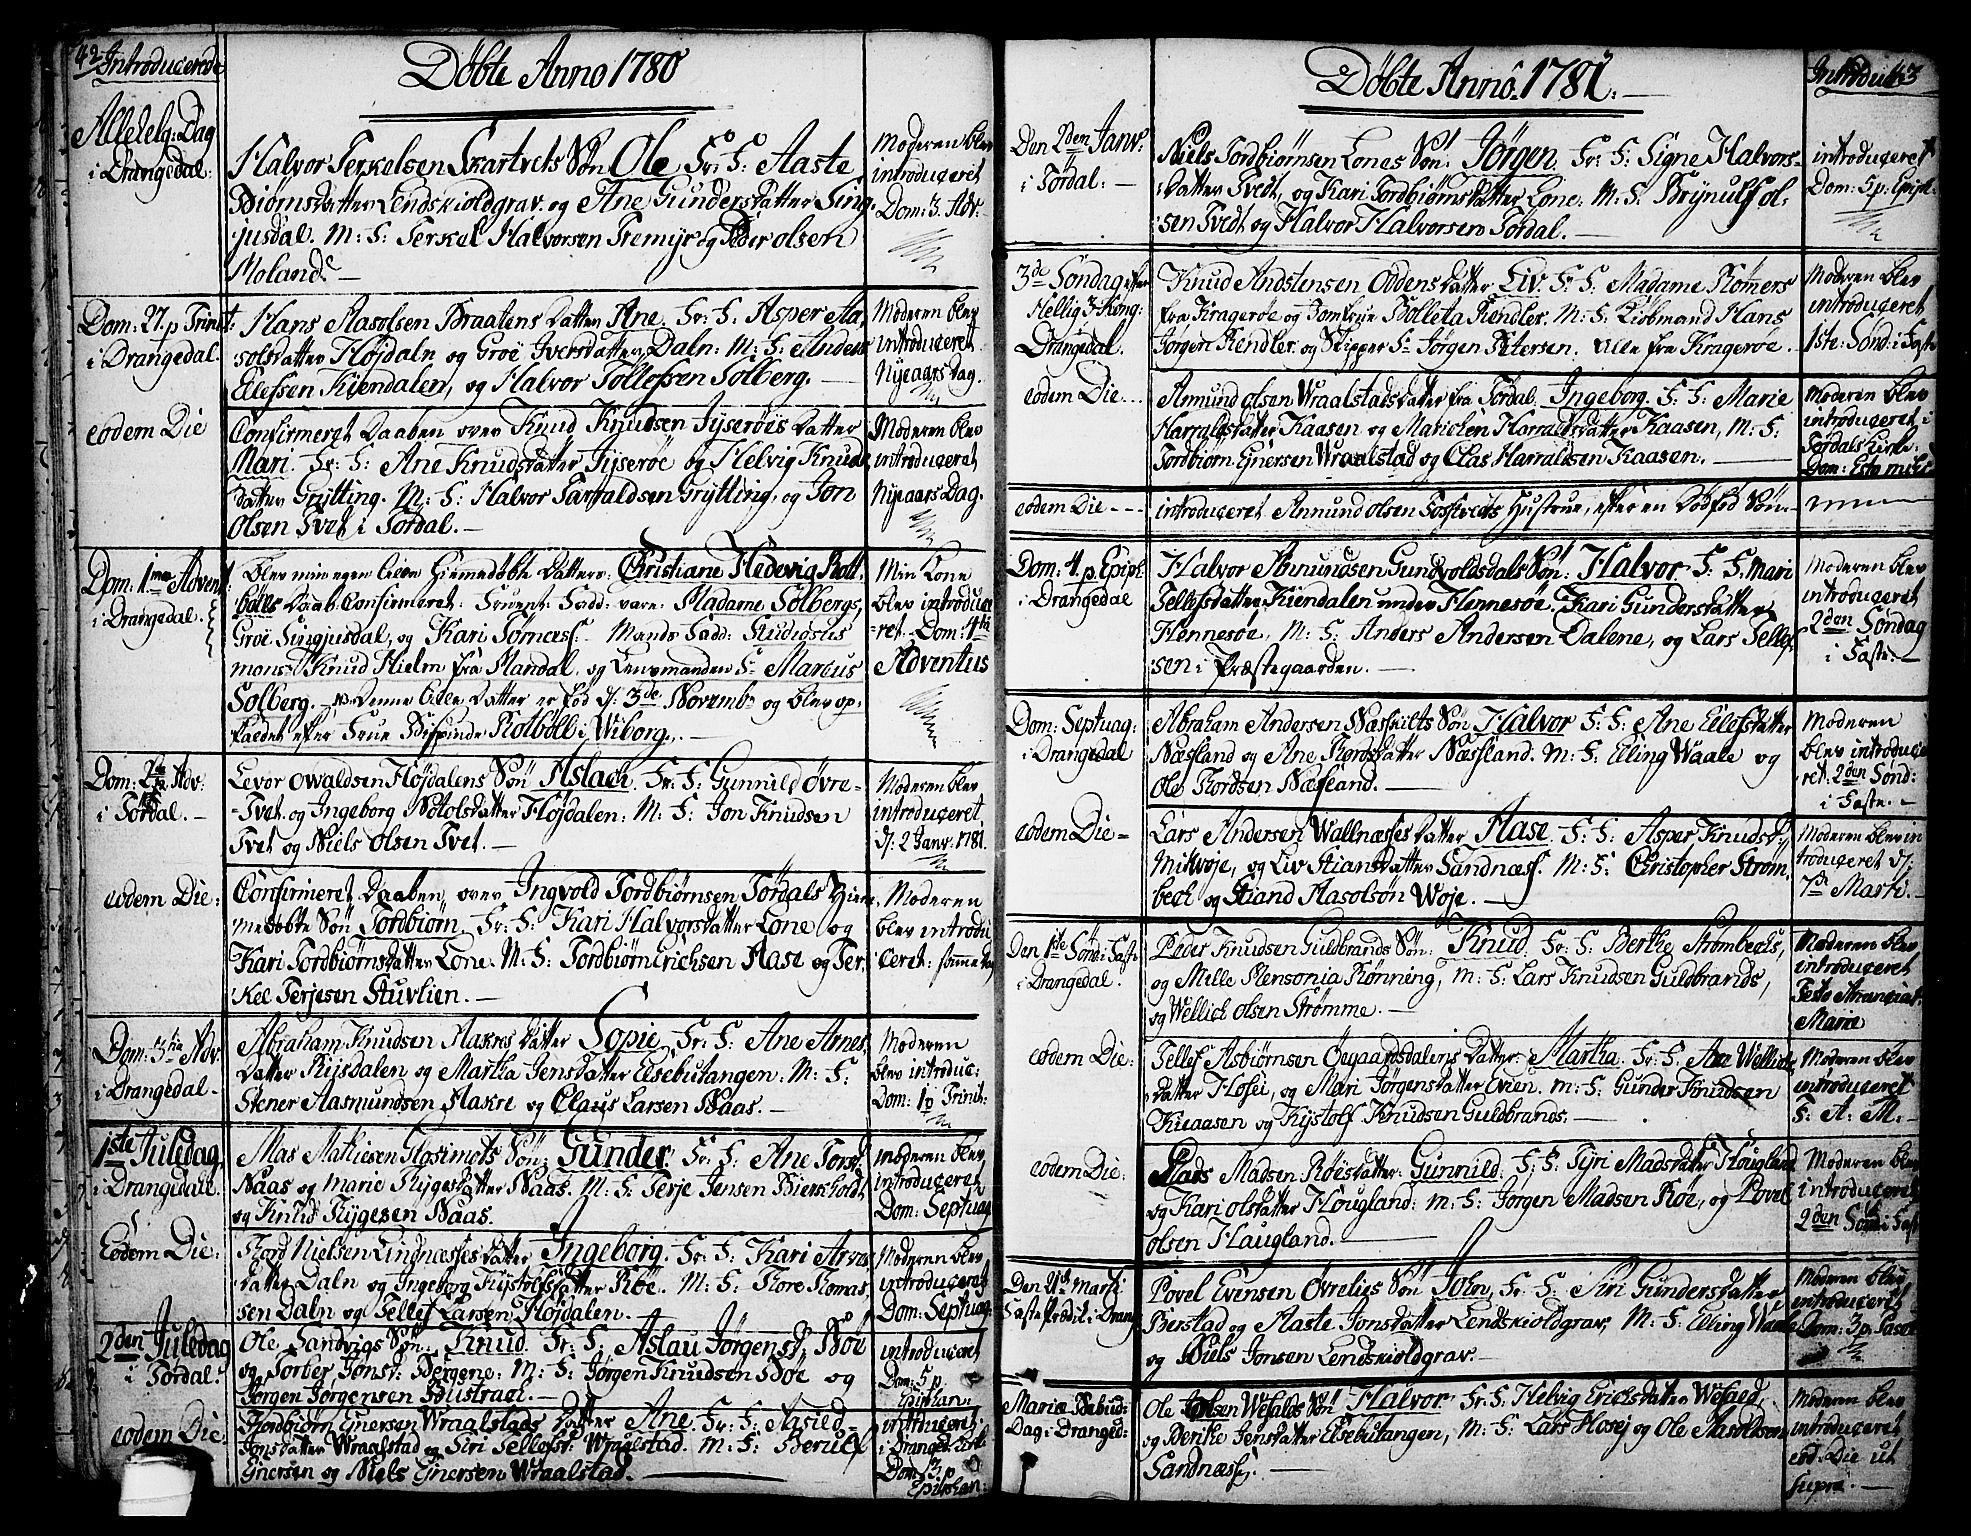 SAKO, Drangedal kirkebøker, F/Fa/L0003: Ministerialbok nr. 3, 1768-1814, s. 42-43